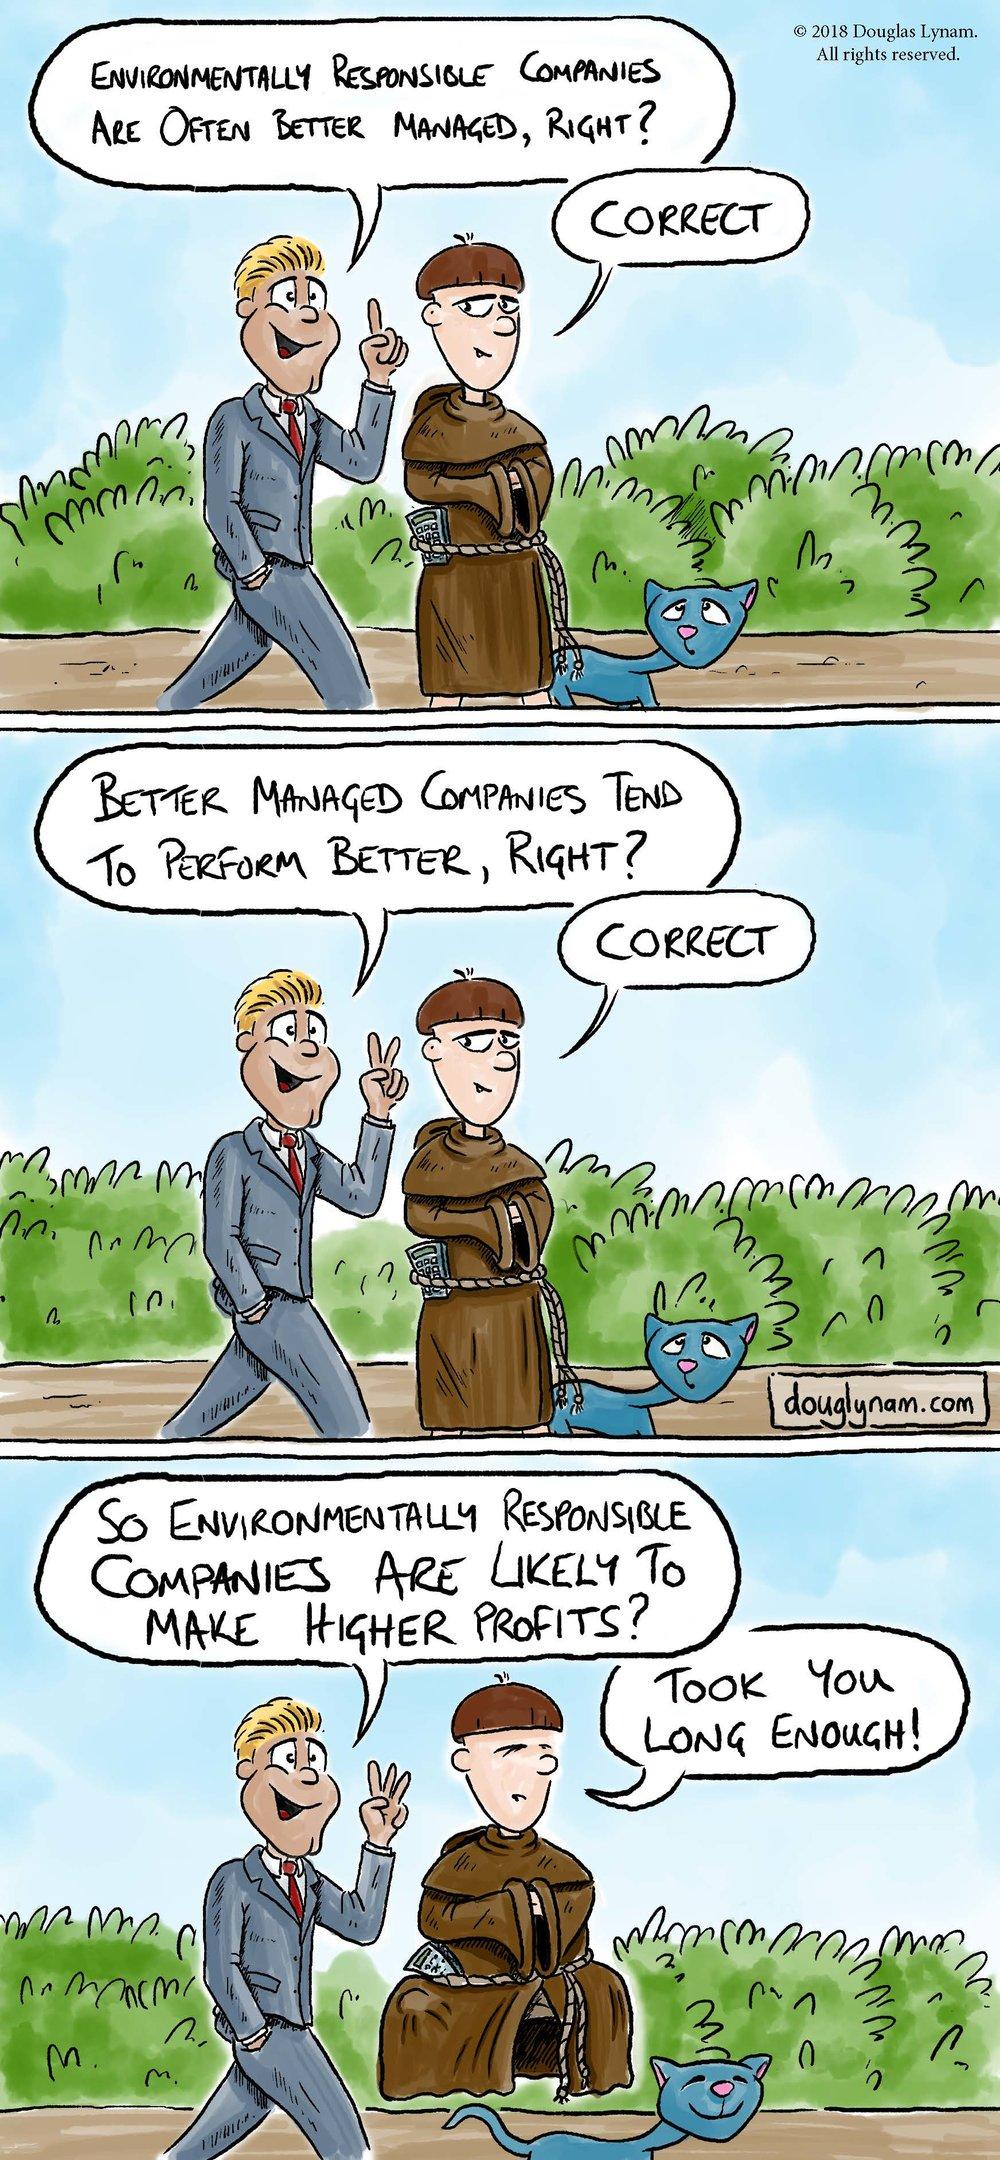 Environmentally Responsible Companies.jpg